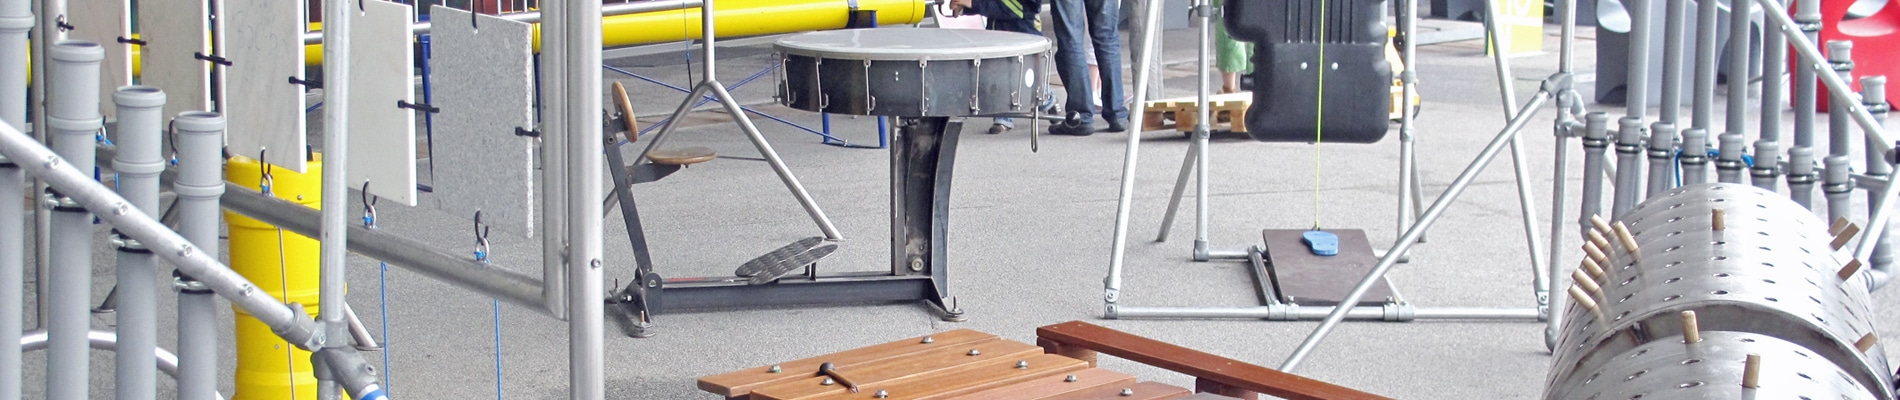 Sound Playground